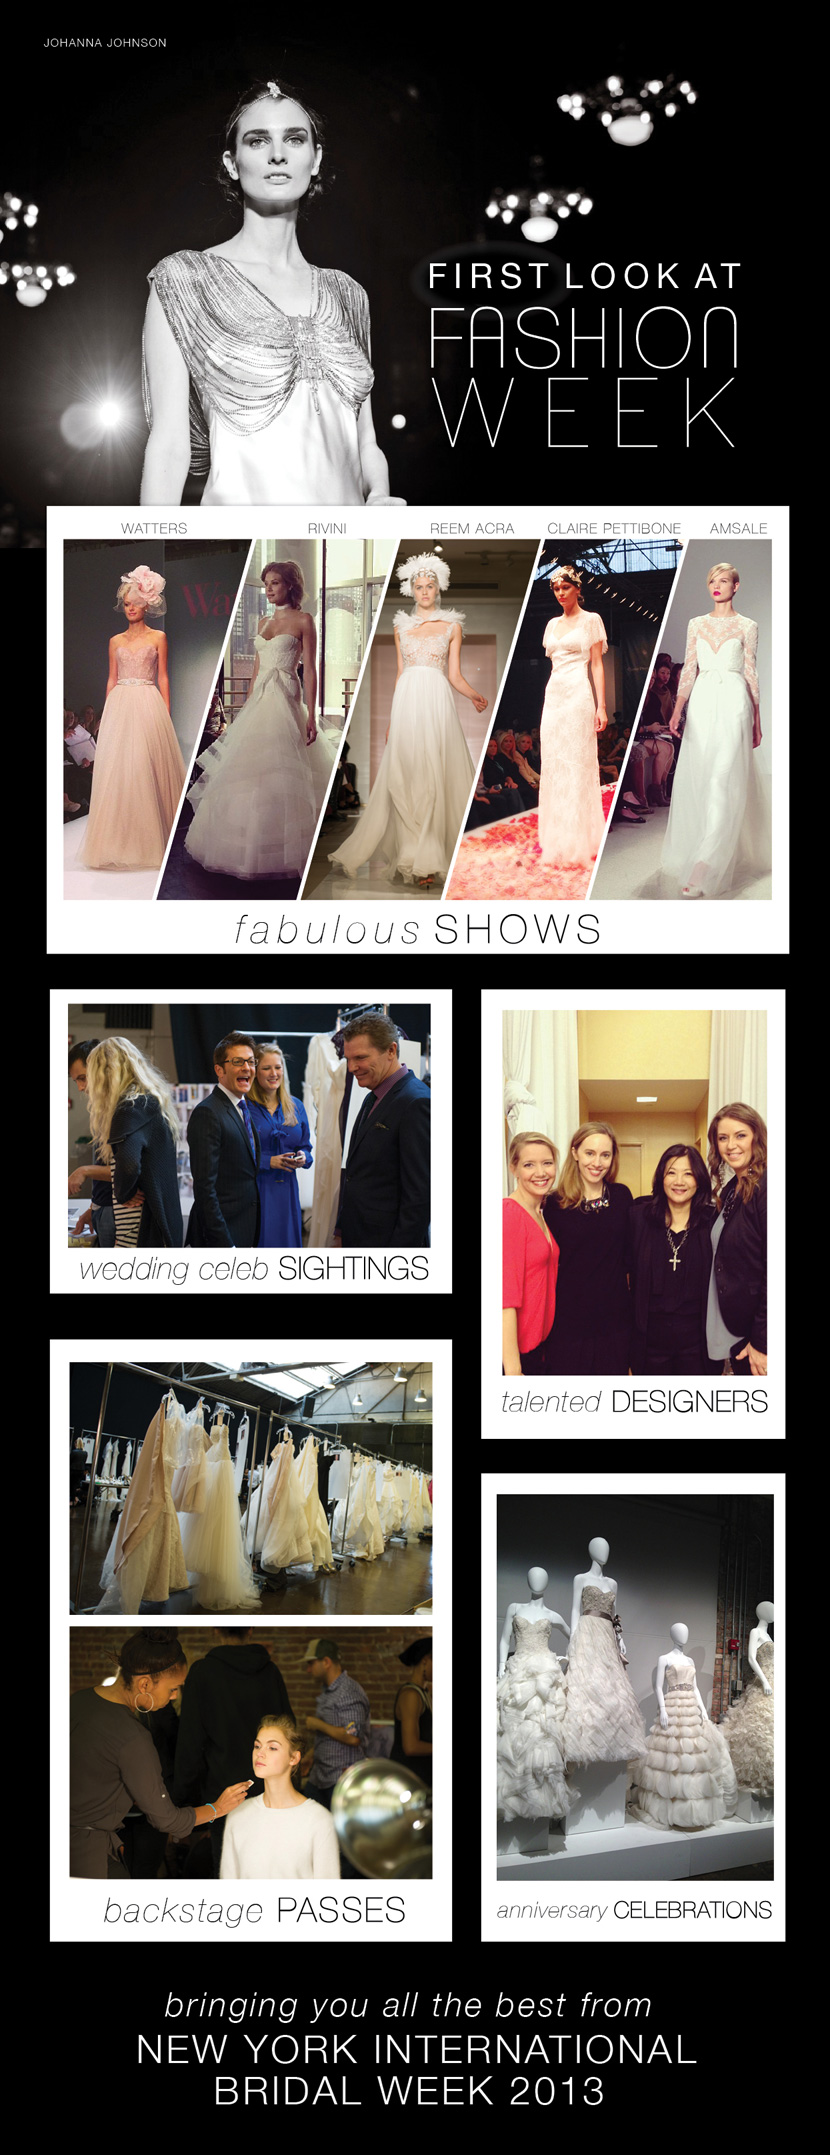 fashionweek_kickoff_2013_update